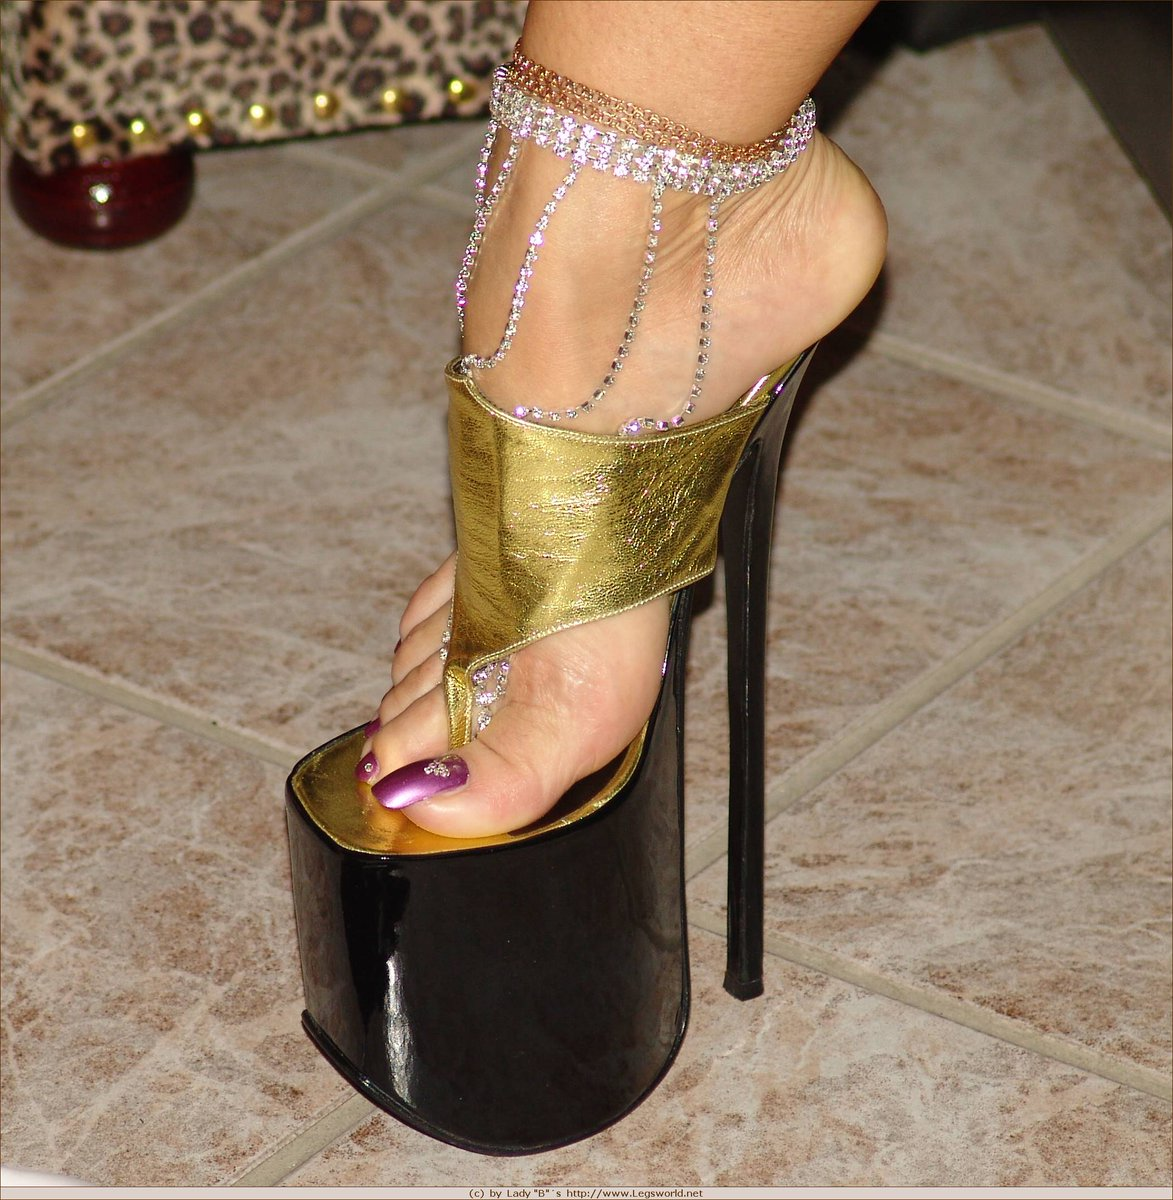 Füße lady barbara Pyle: Gomer